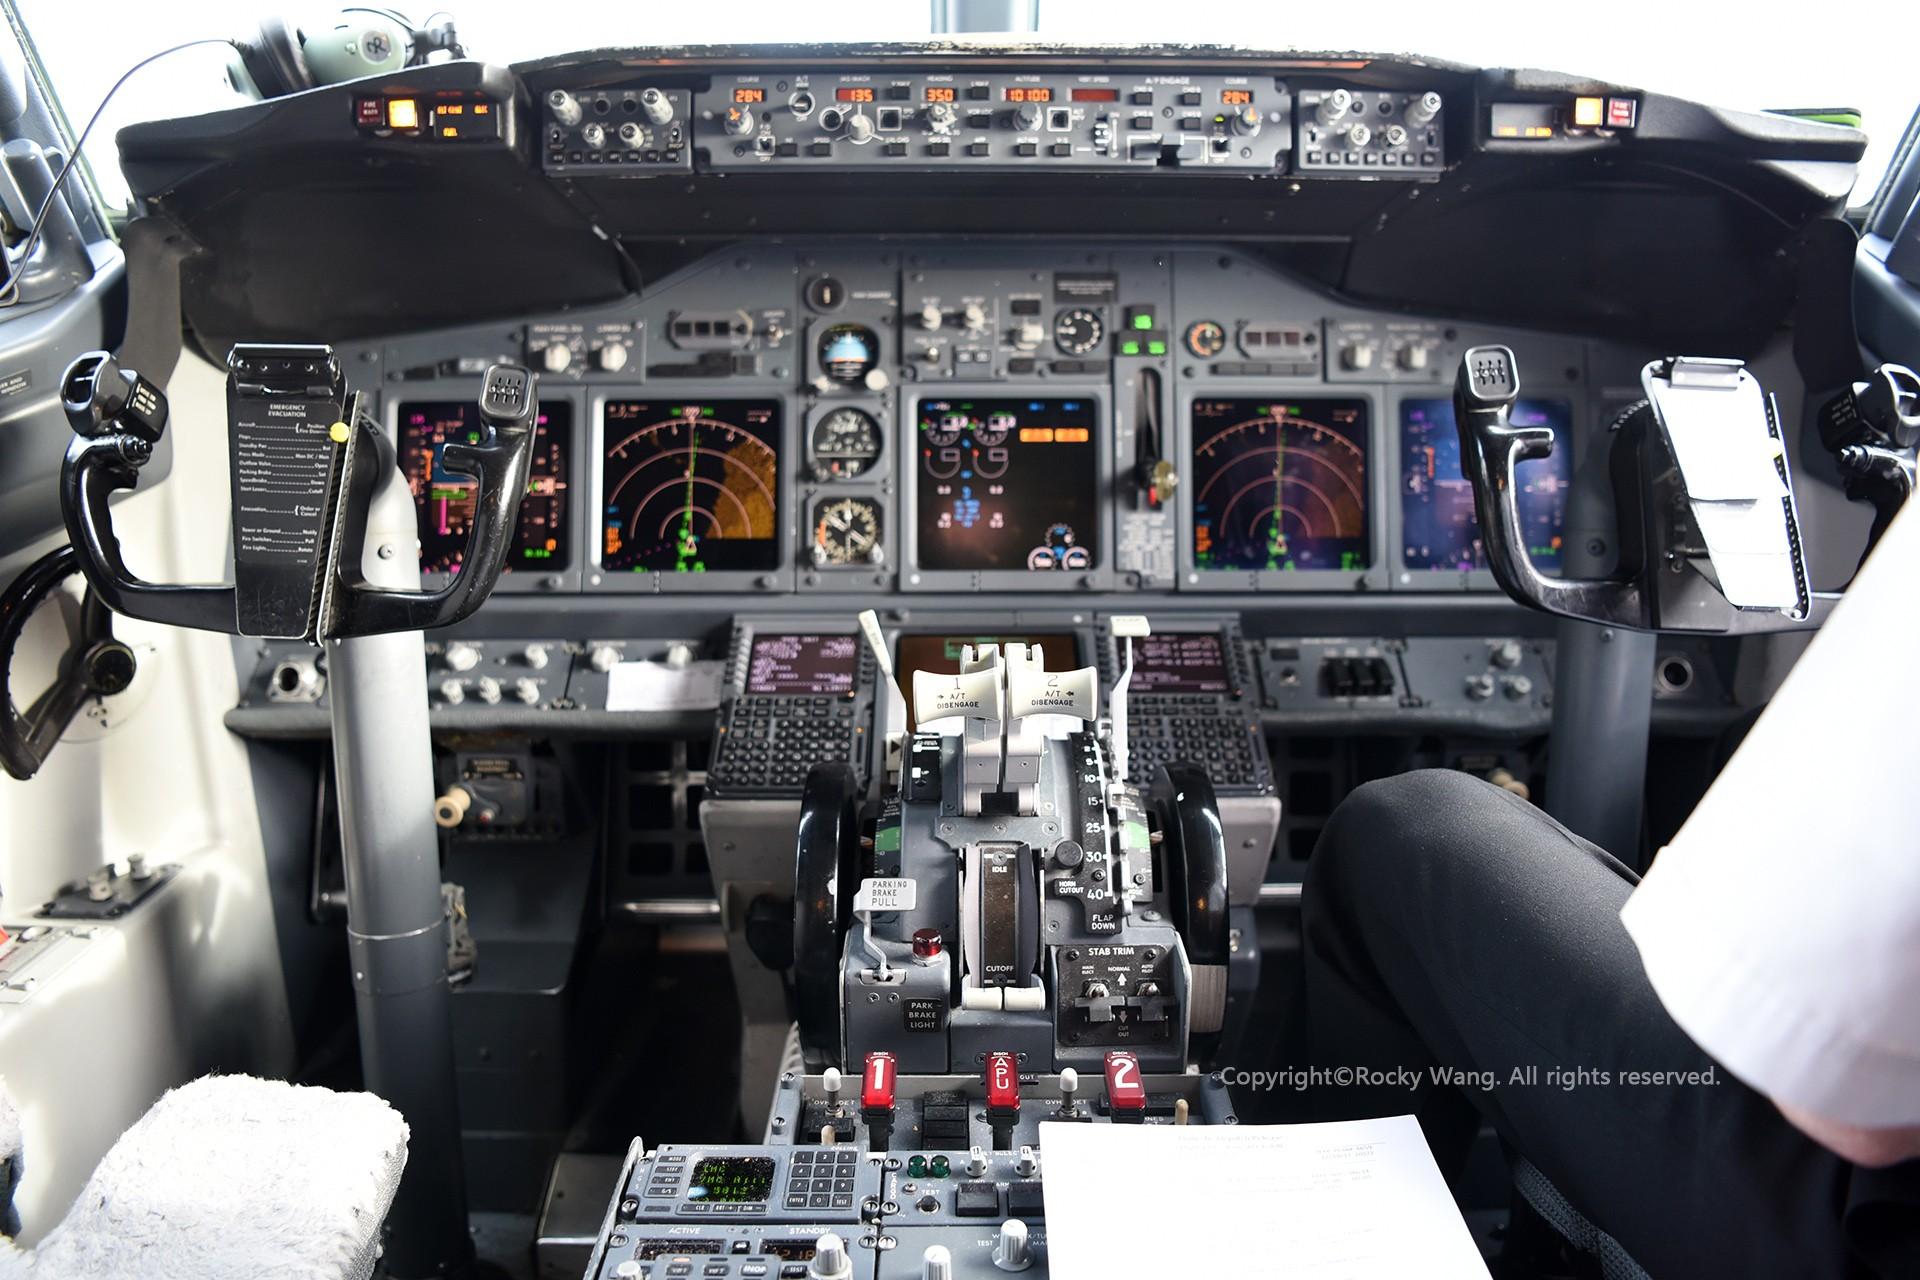 Re:[原创]简易版游记,纪念一次30段的环球飞行和一些碎碎念 BOEING 737-7BK N7824A San Francisco Int'l Airport